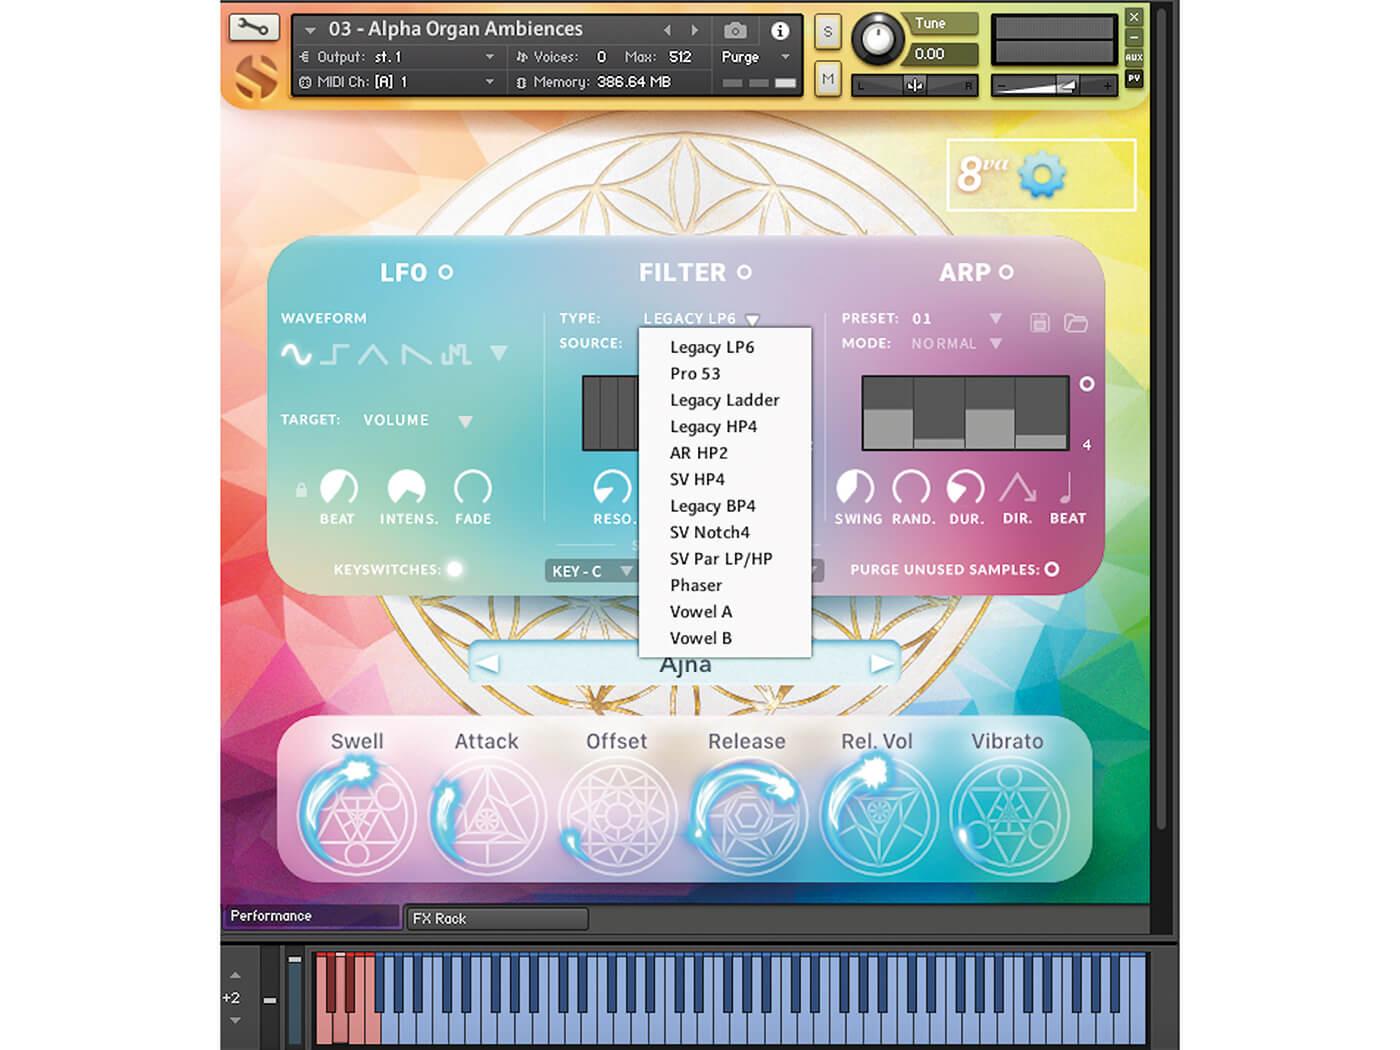 Soundiron Alpha Organ GUI